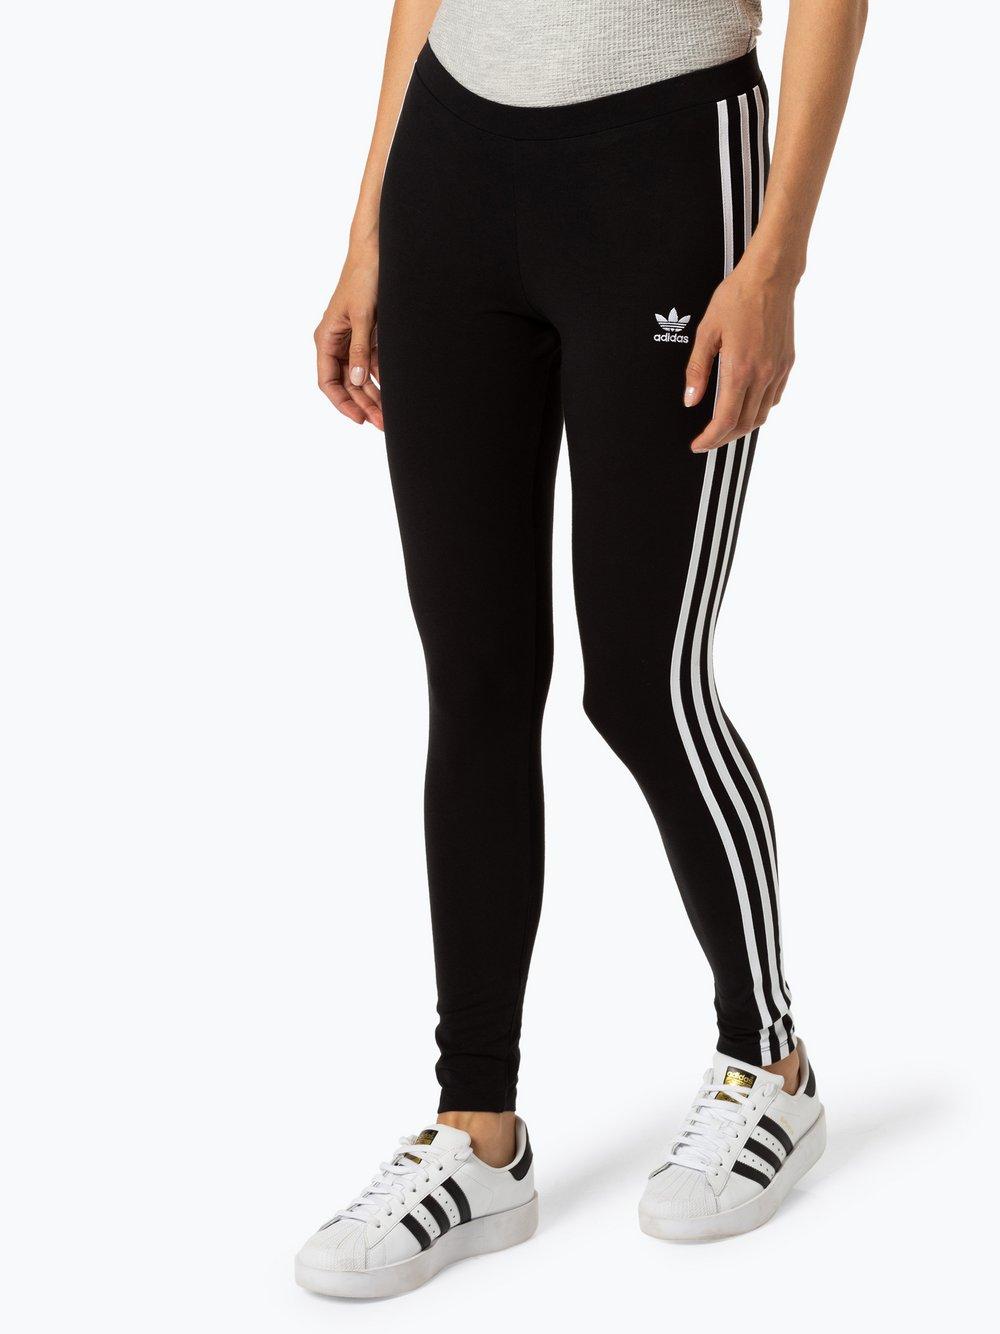 adidas Originals - Sportowe legginsy damskie, czarny